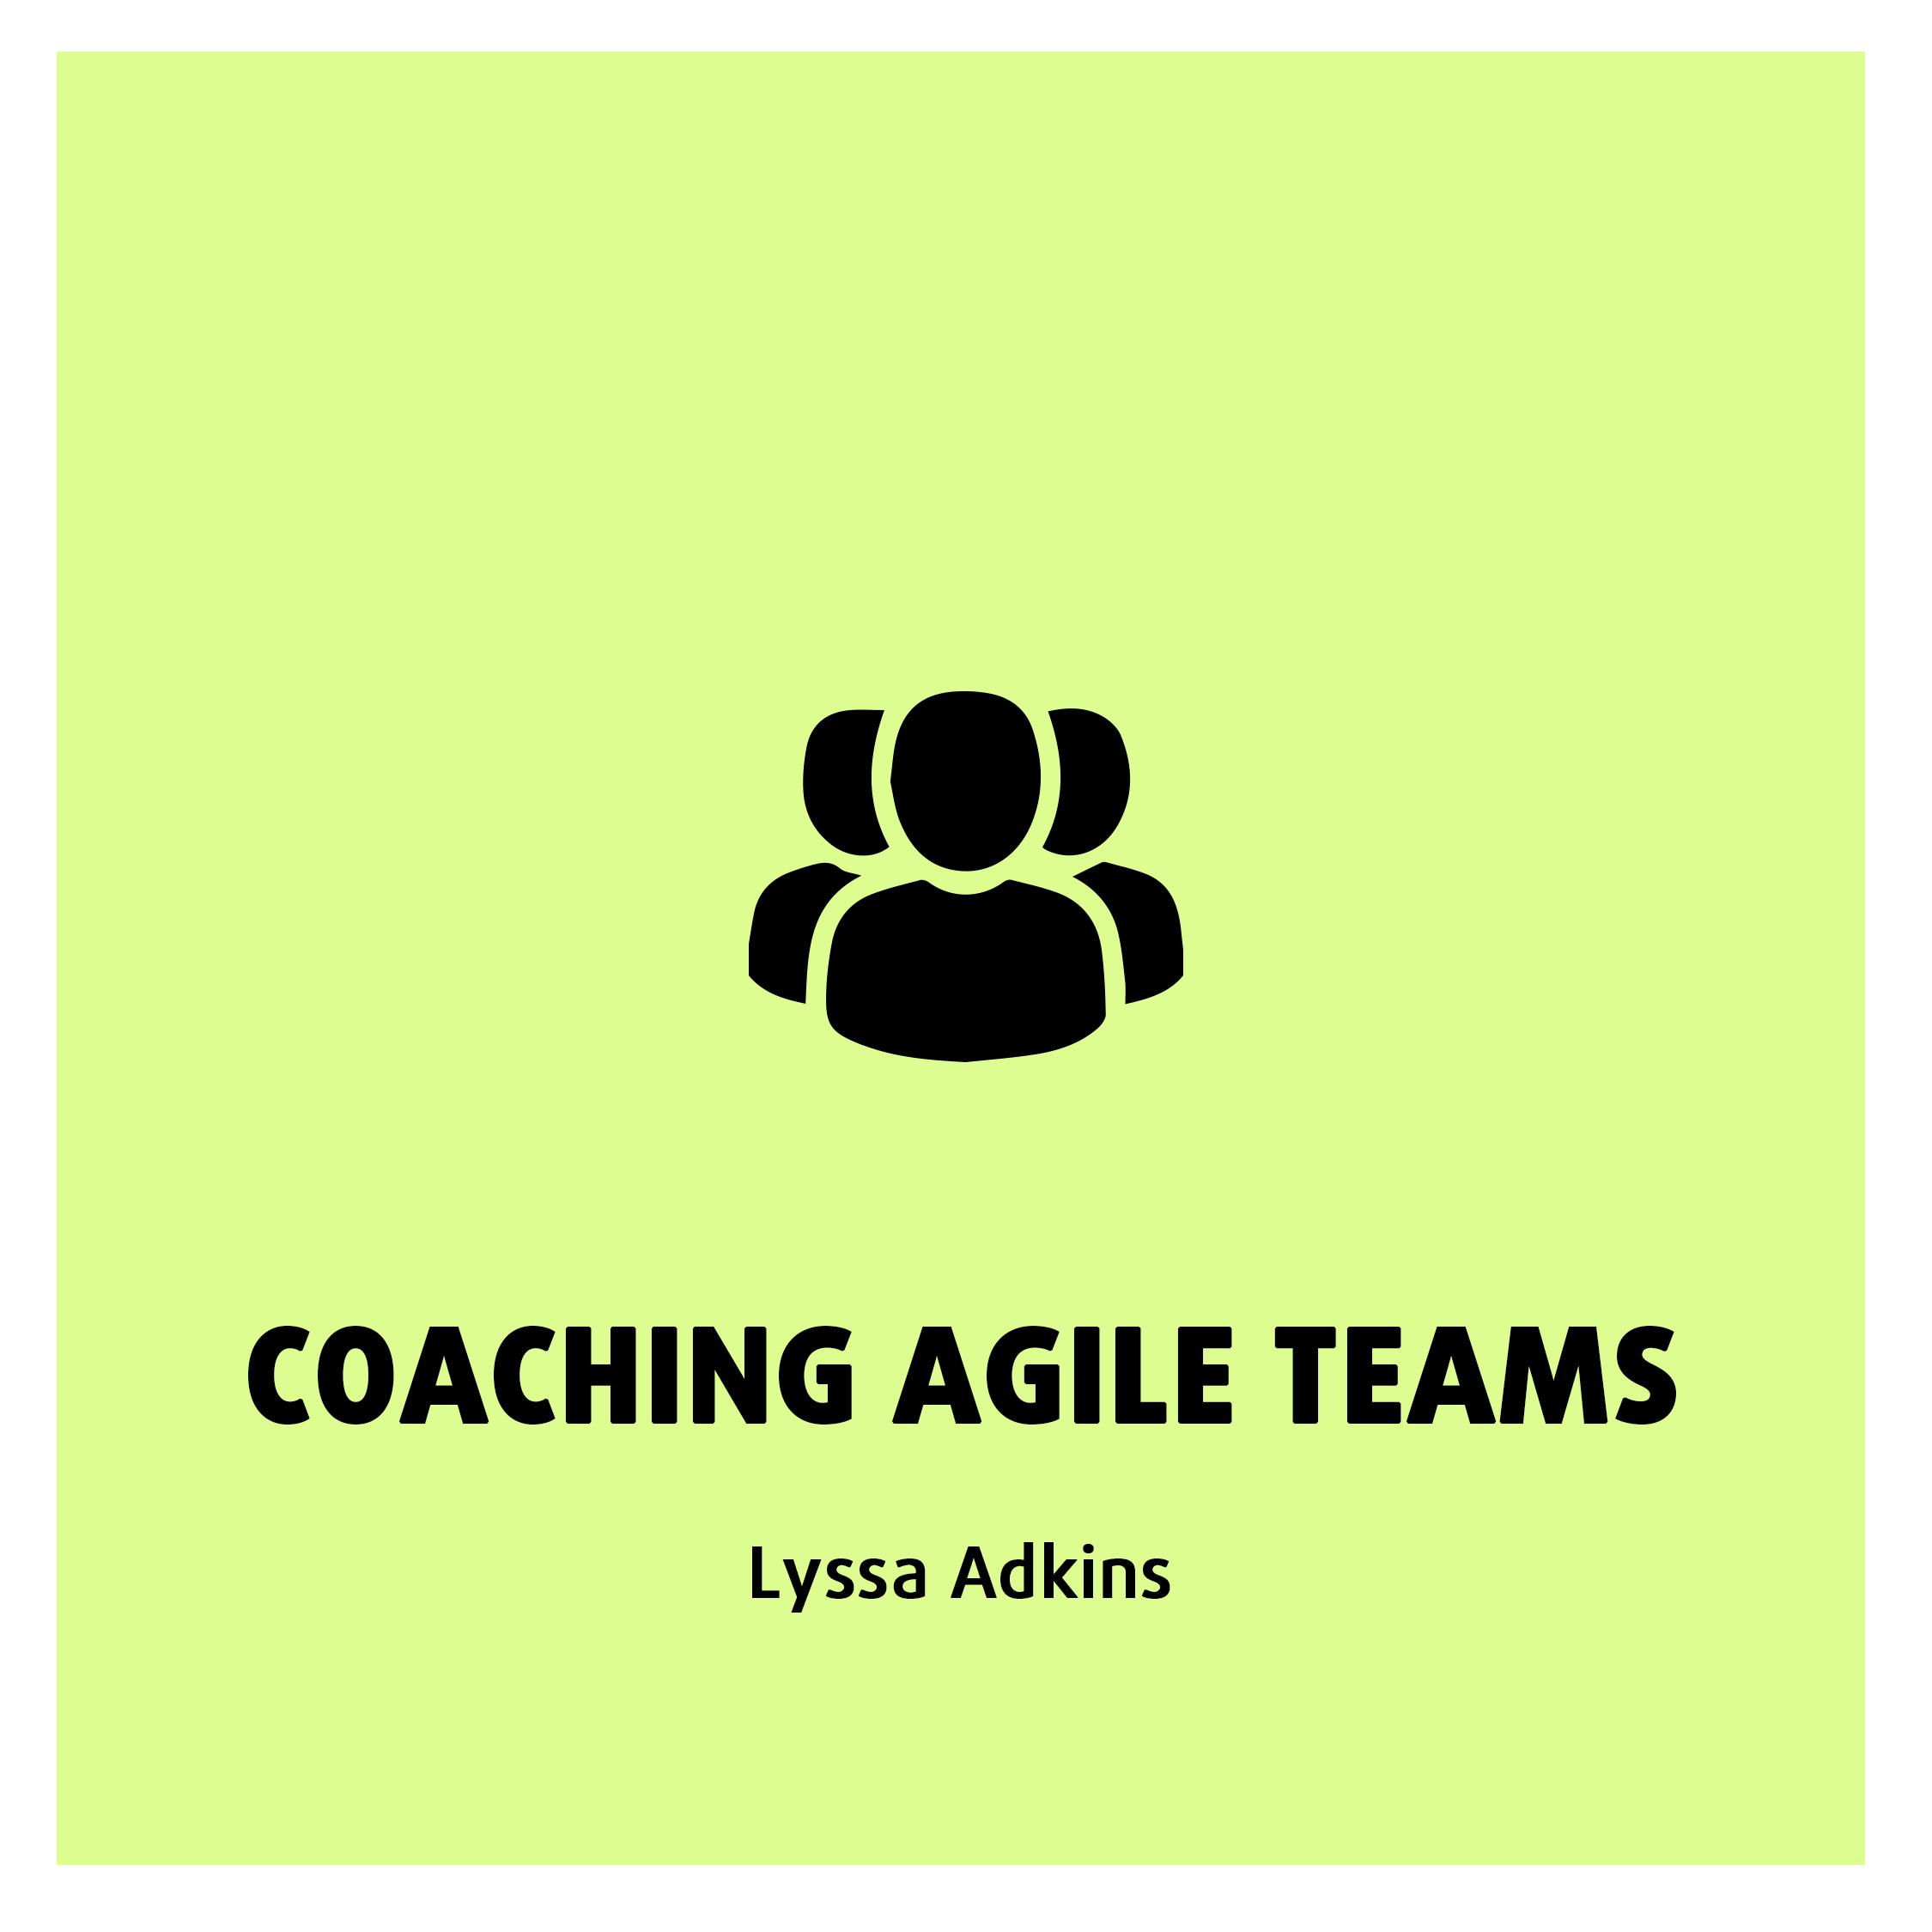 coaching agile teams by adkins - книга для тестировщиков QA